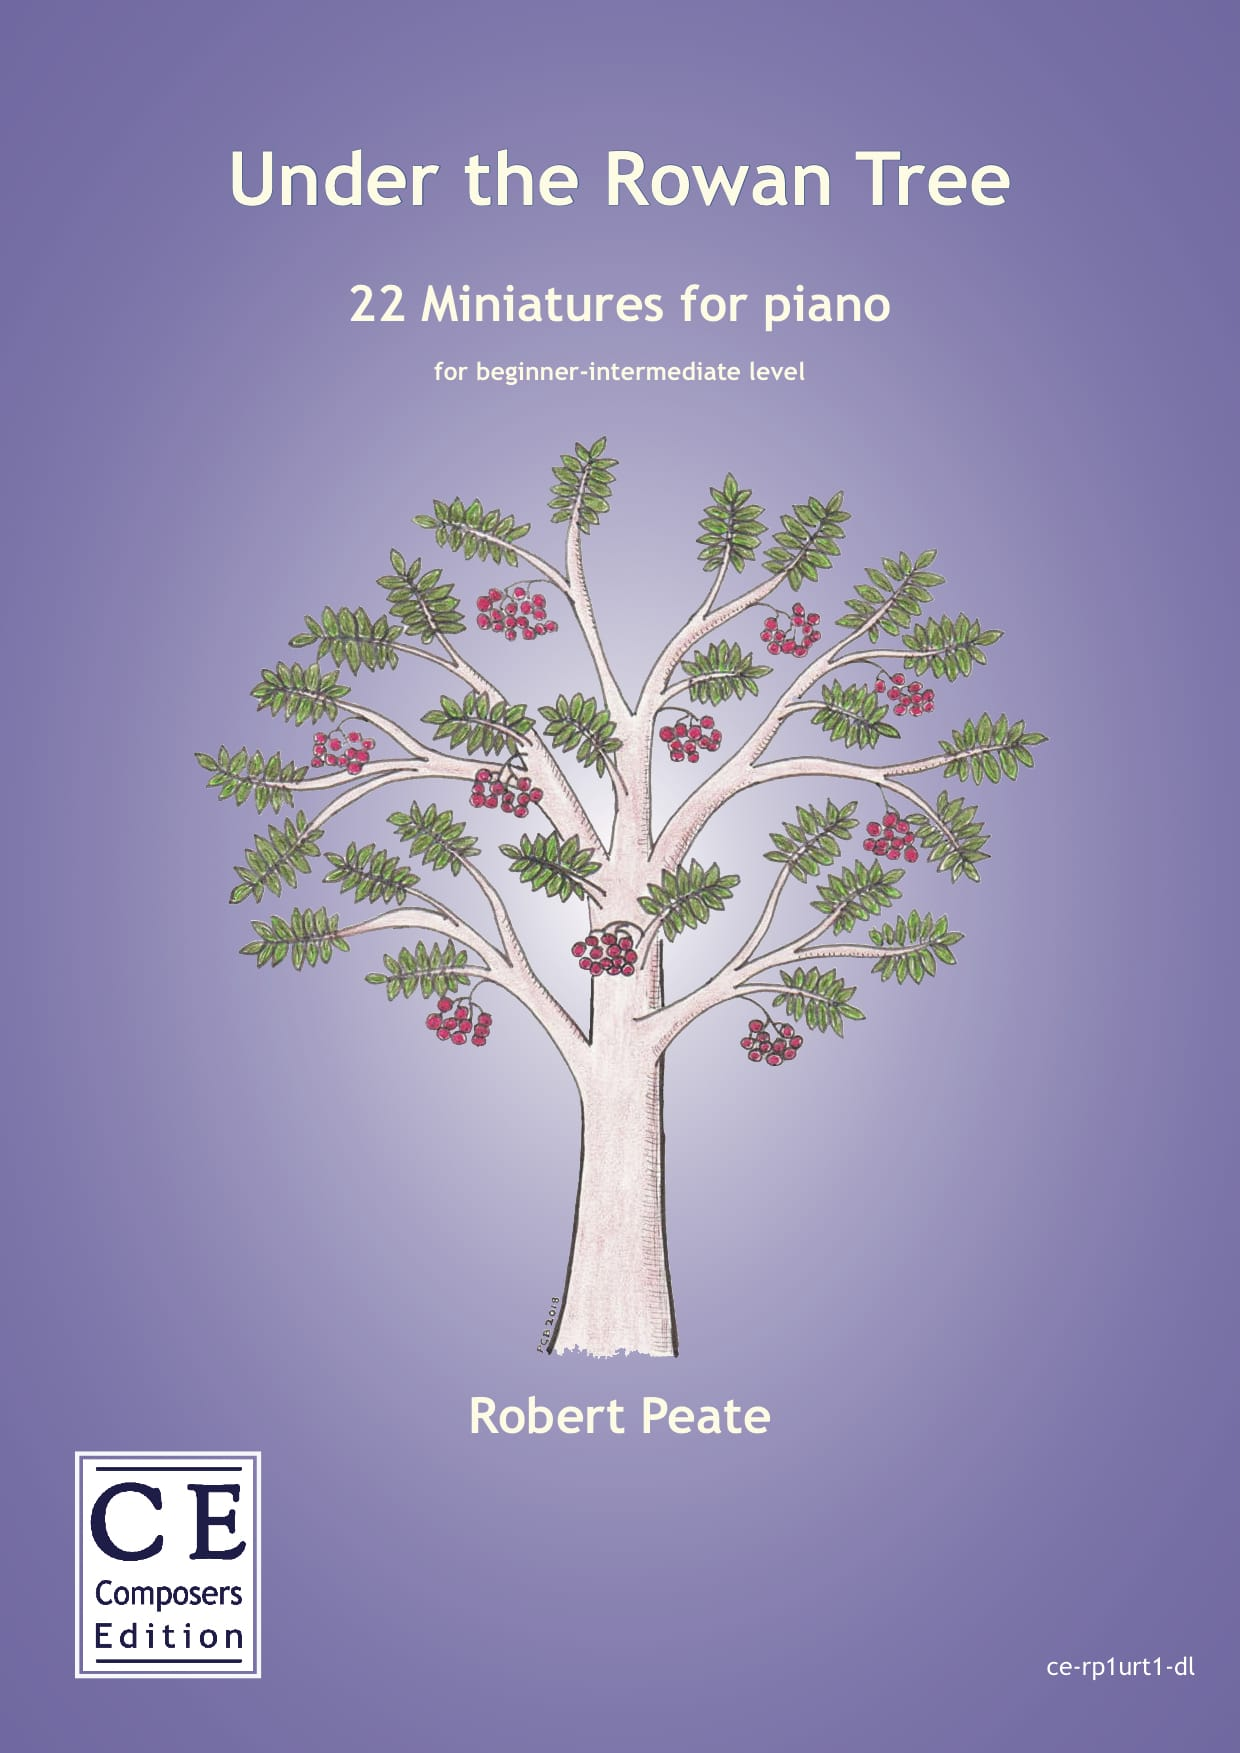 Robert Peate: Under the Rowan Tree 22 Miniatures for piano